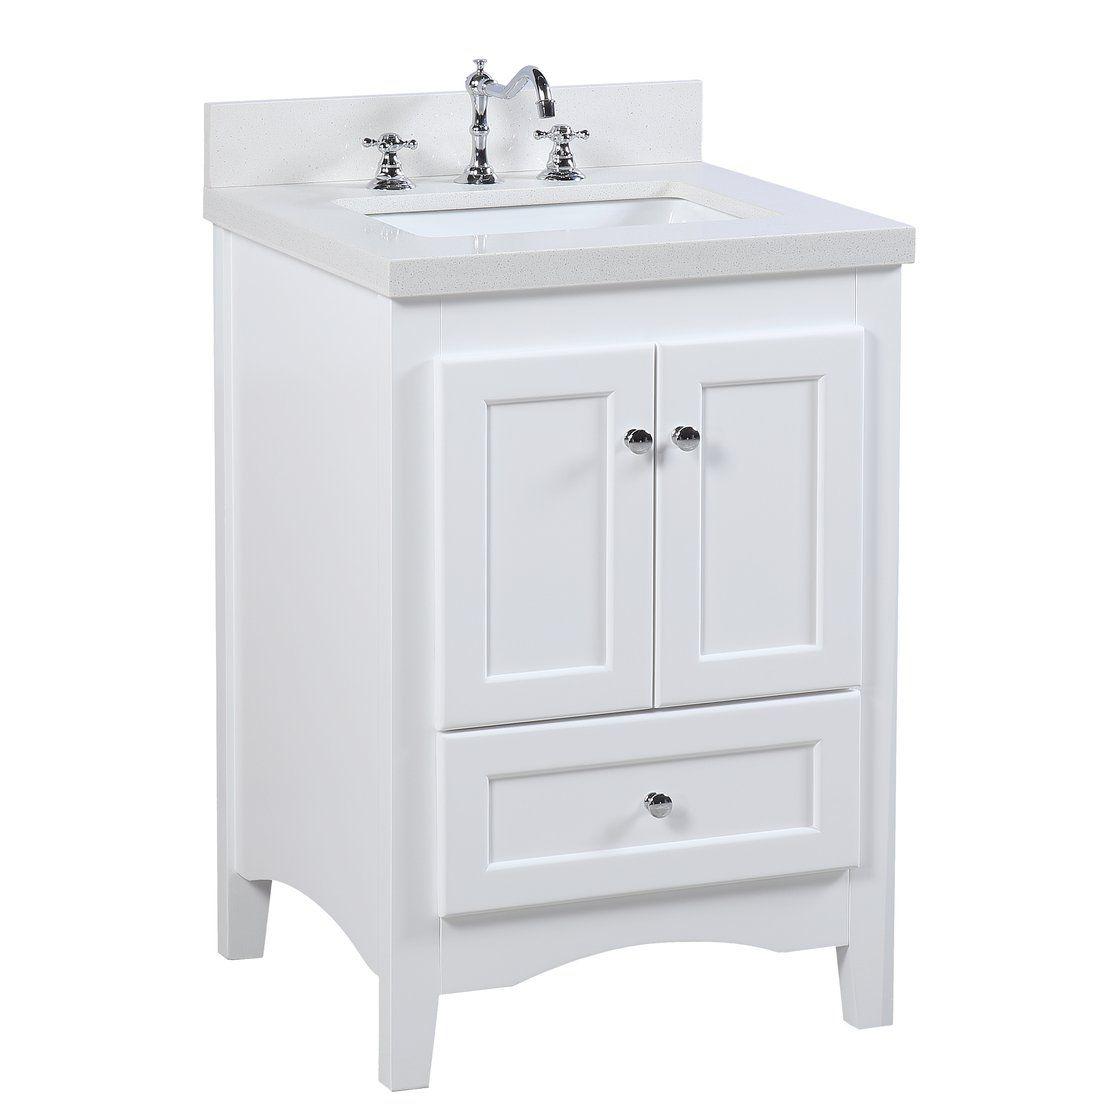 Abbey 24 Inch Vanity With Quartz Top Single Bathroom Vanity Bathroom Vanity 24 Inch Bathroom Vanity